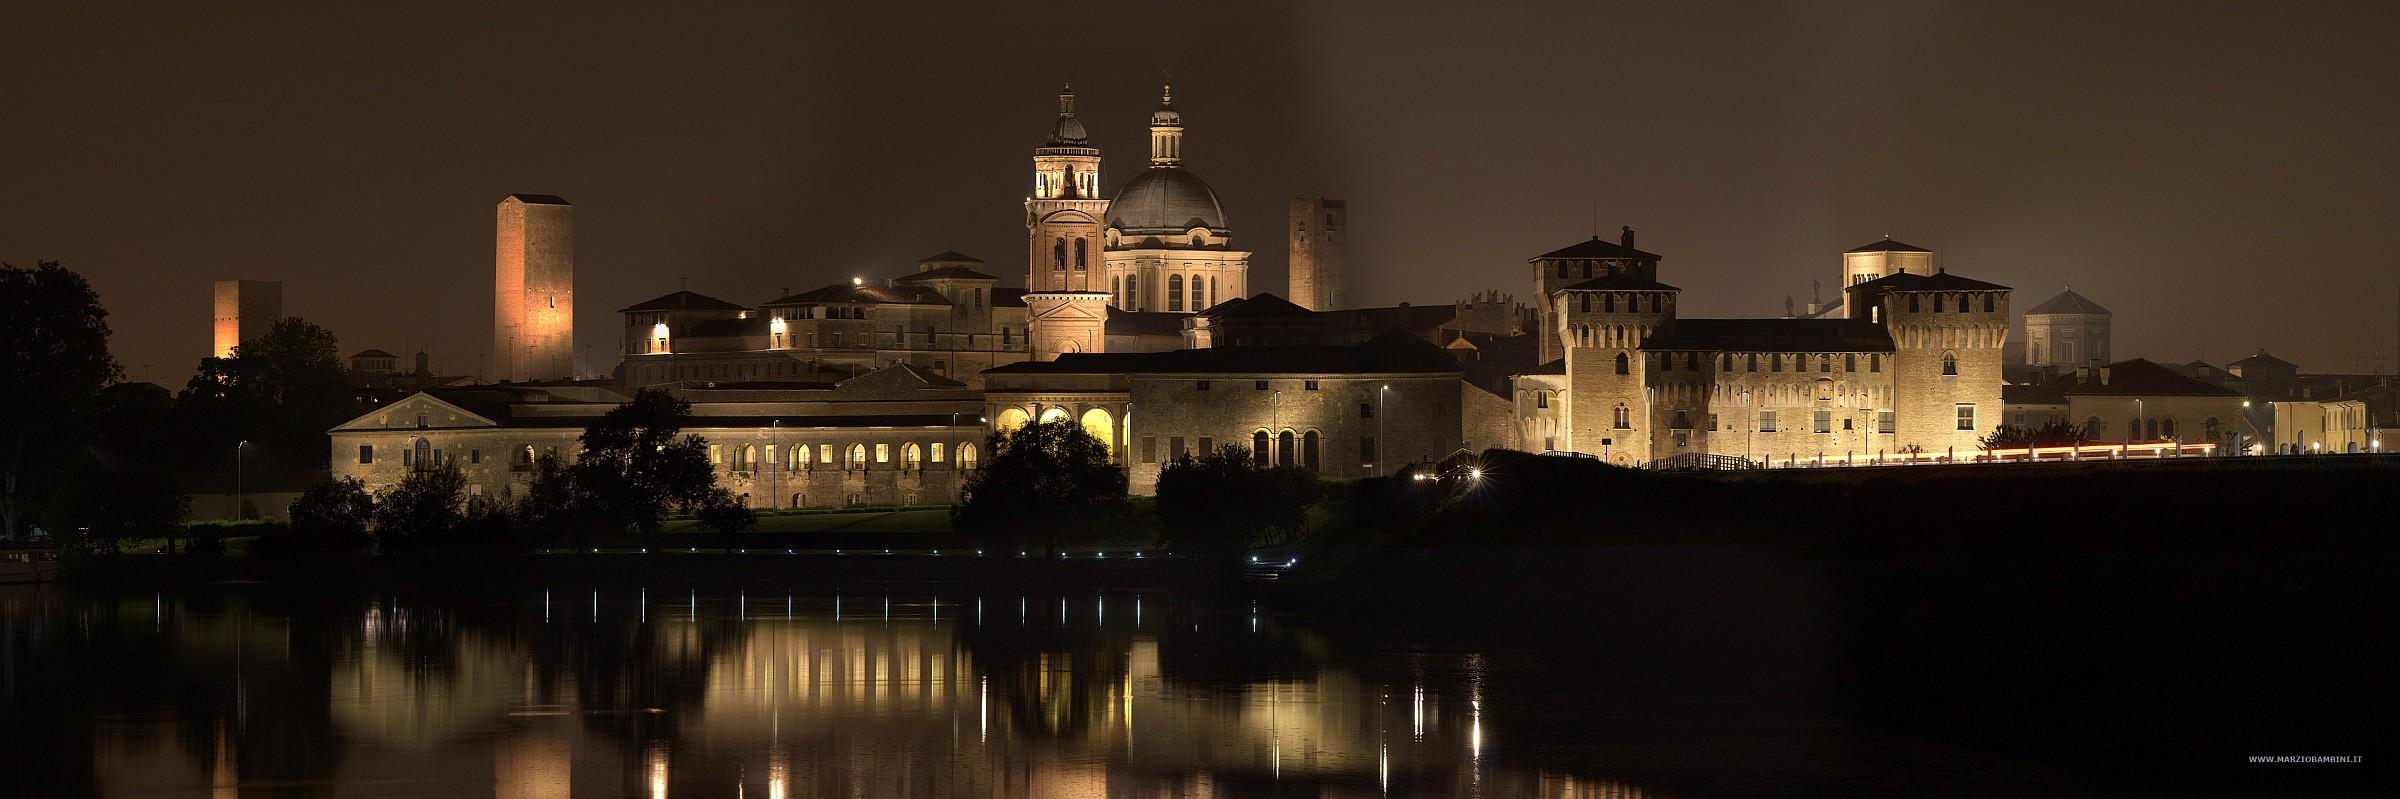 Mantua ... an hour before the earthquake...